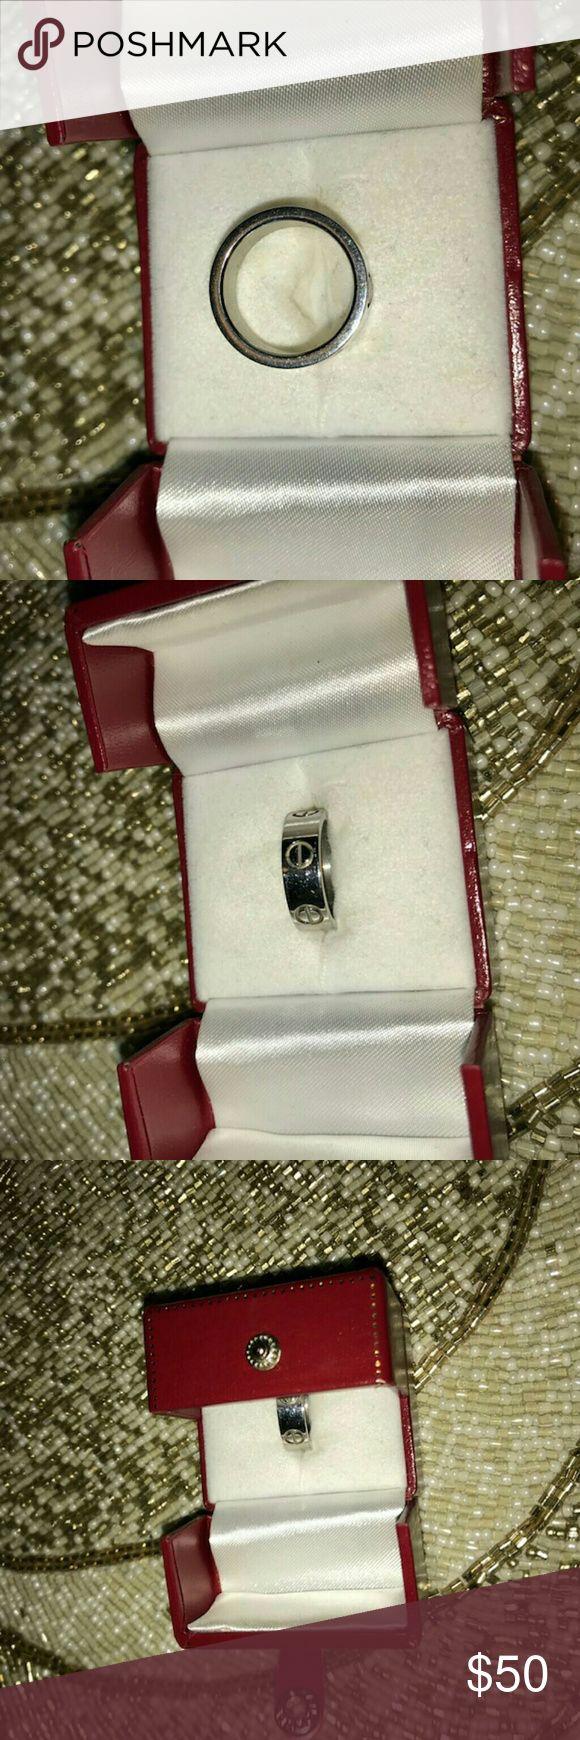 Mens width cartier ring No inscription Cartier Accessories Jewelry